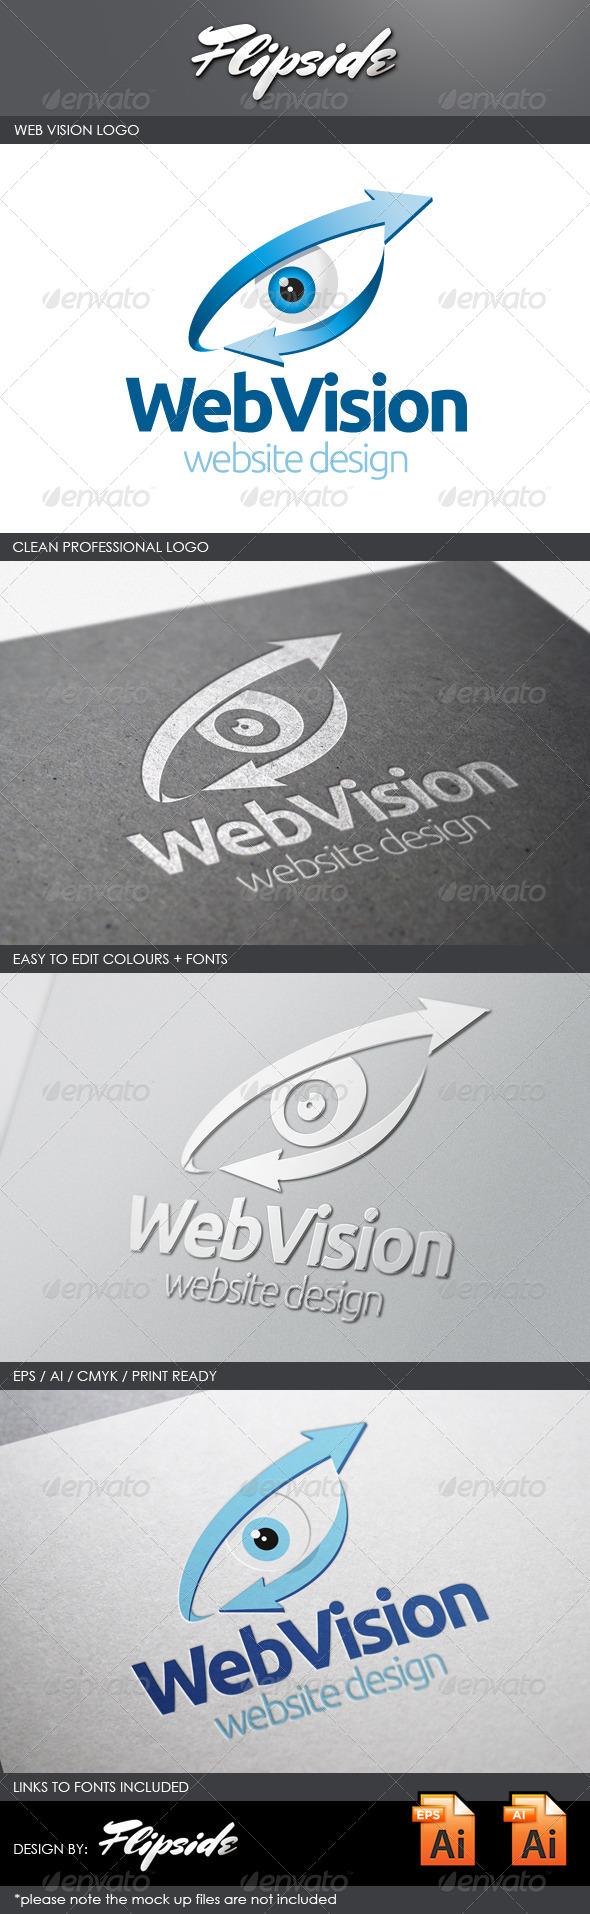 GraphicRiver Web Vision Logo 4329237